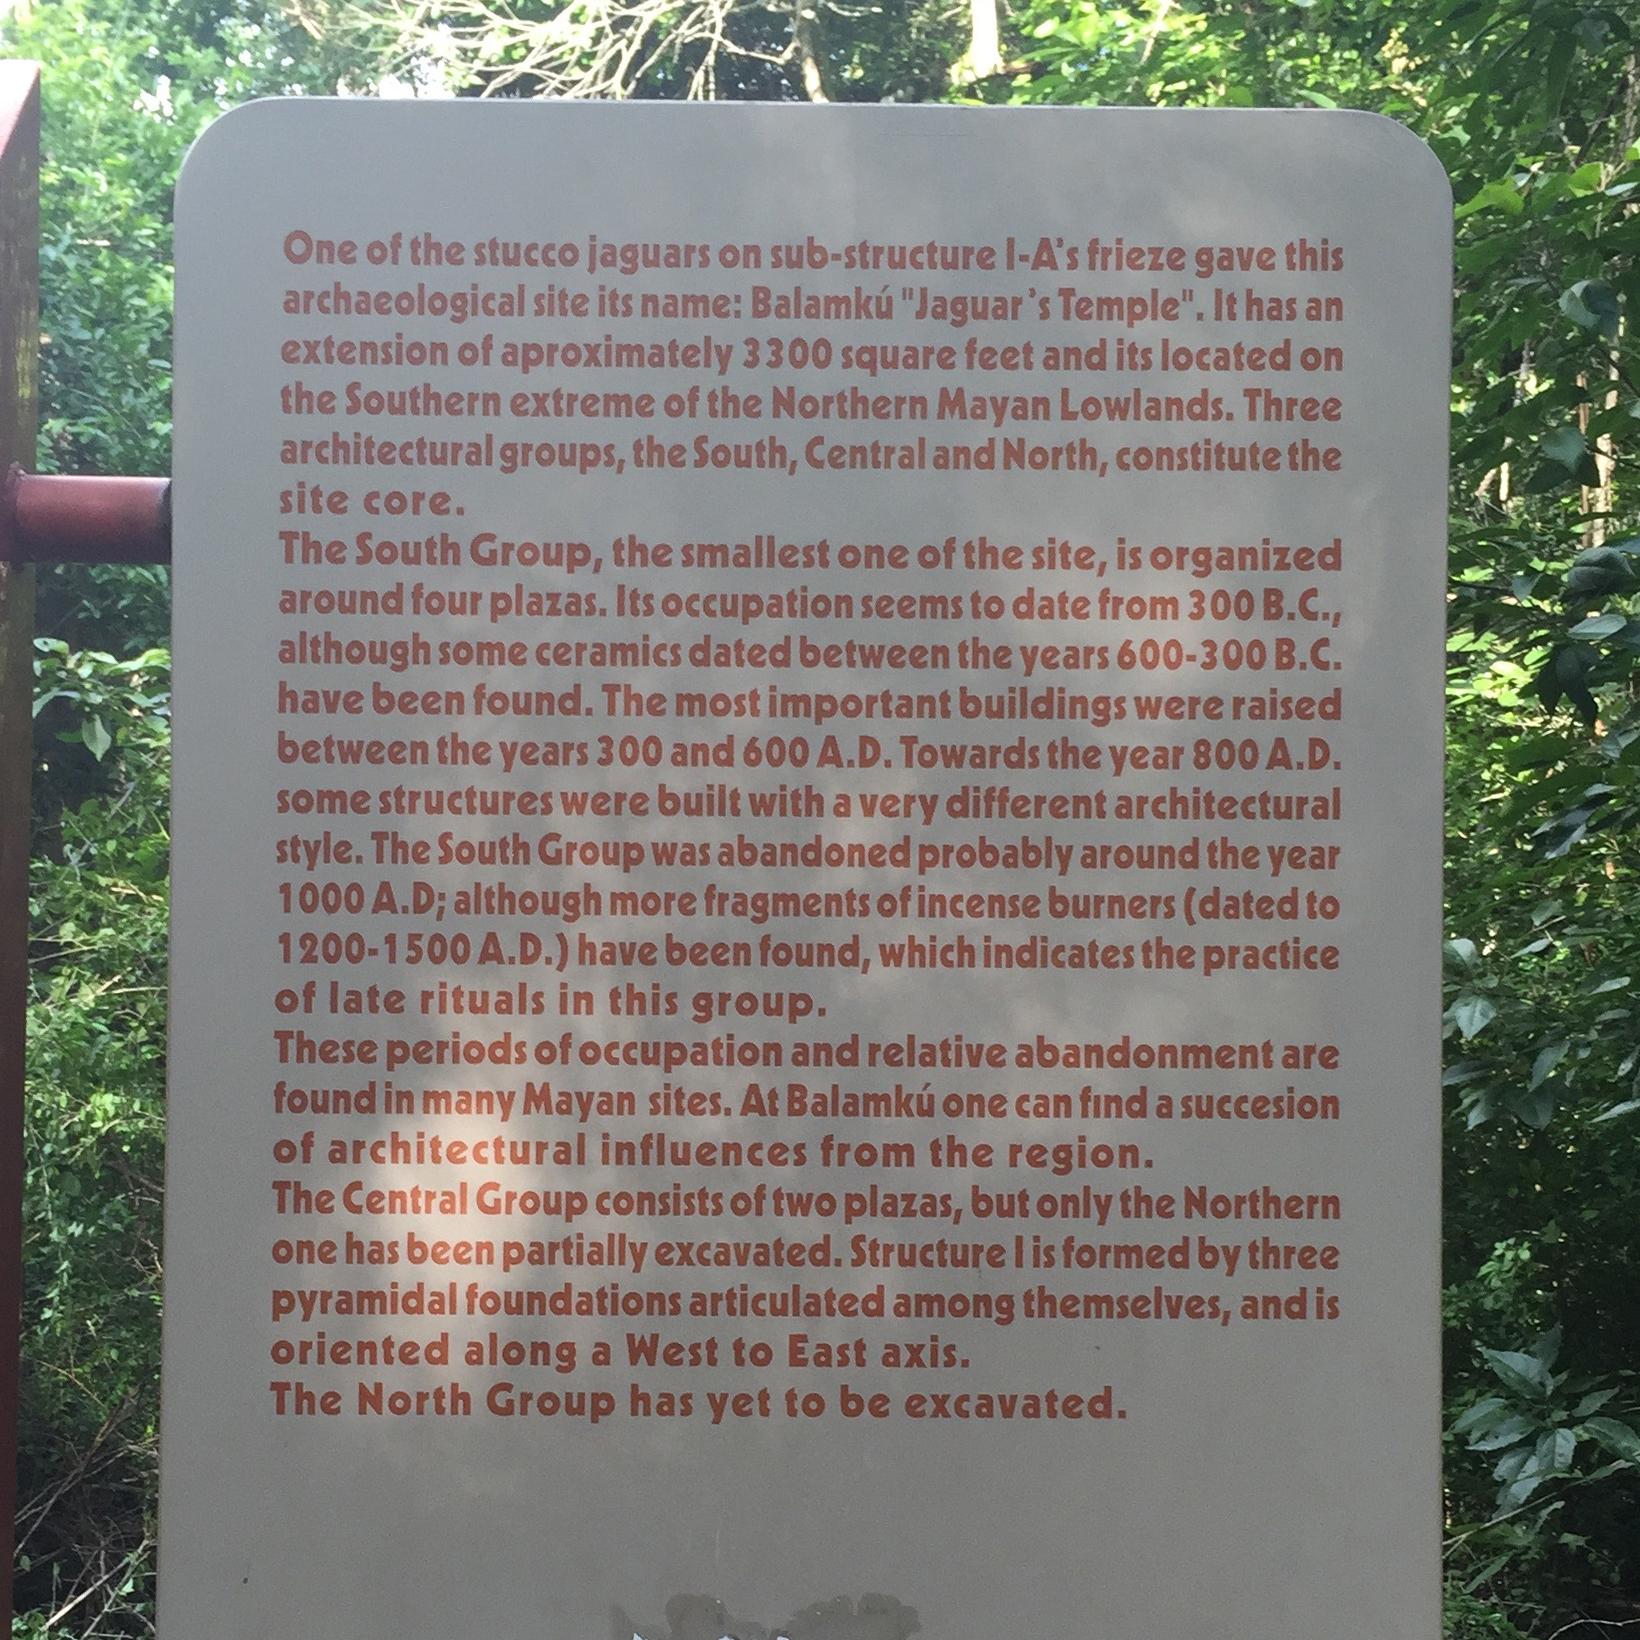 some details about Balamku